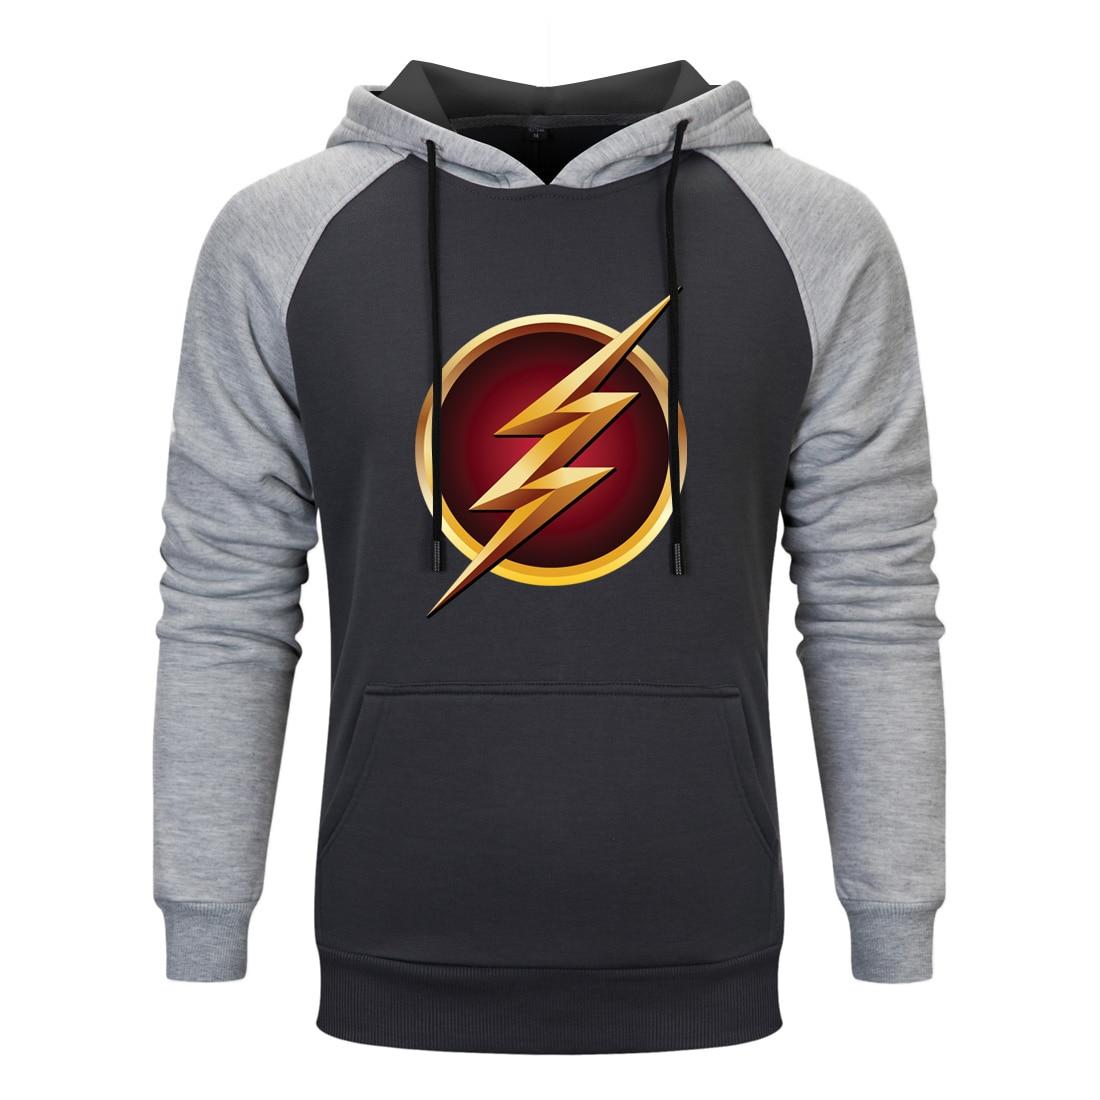 The Flash Super Hero Raglan Hooded Hoodies Men Spring Autumn Sweatshirts 2020 Casual Fleece Pullovers Male Casual Hipster Coats